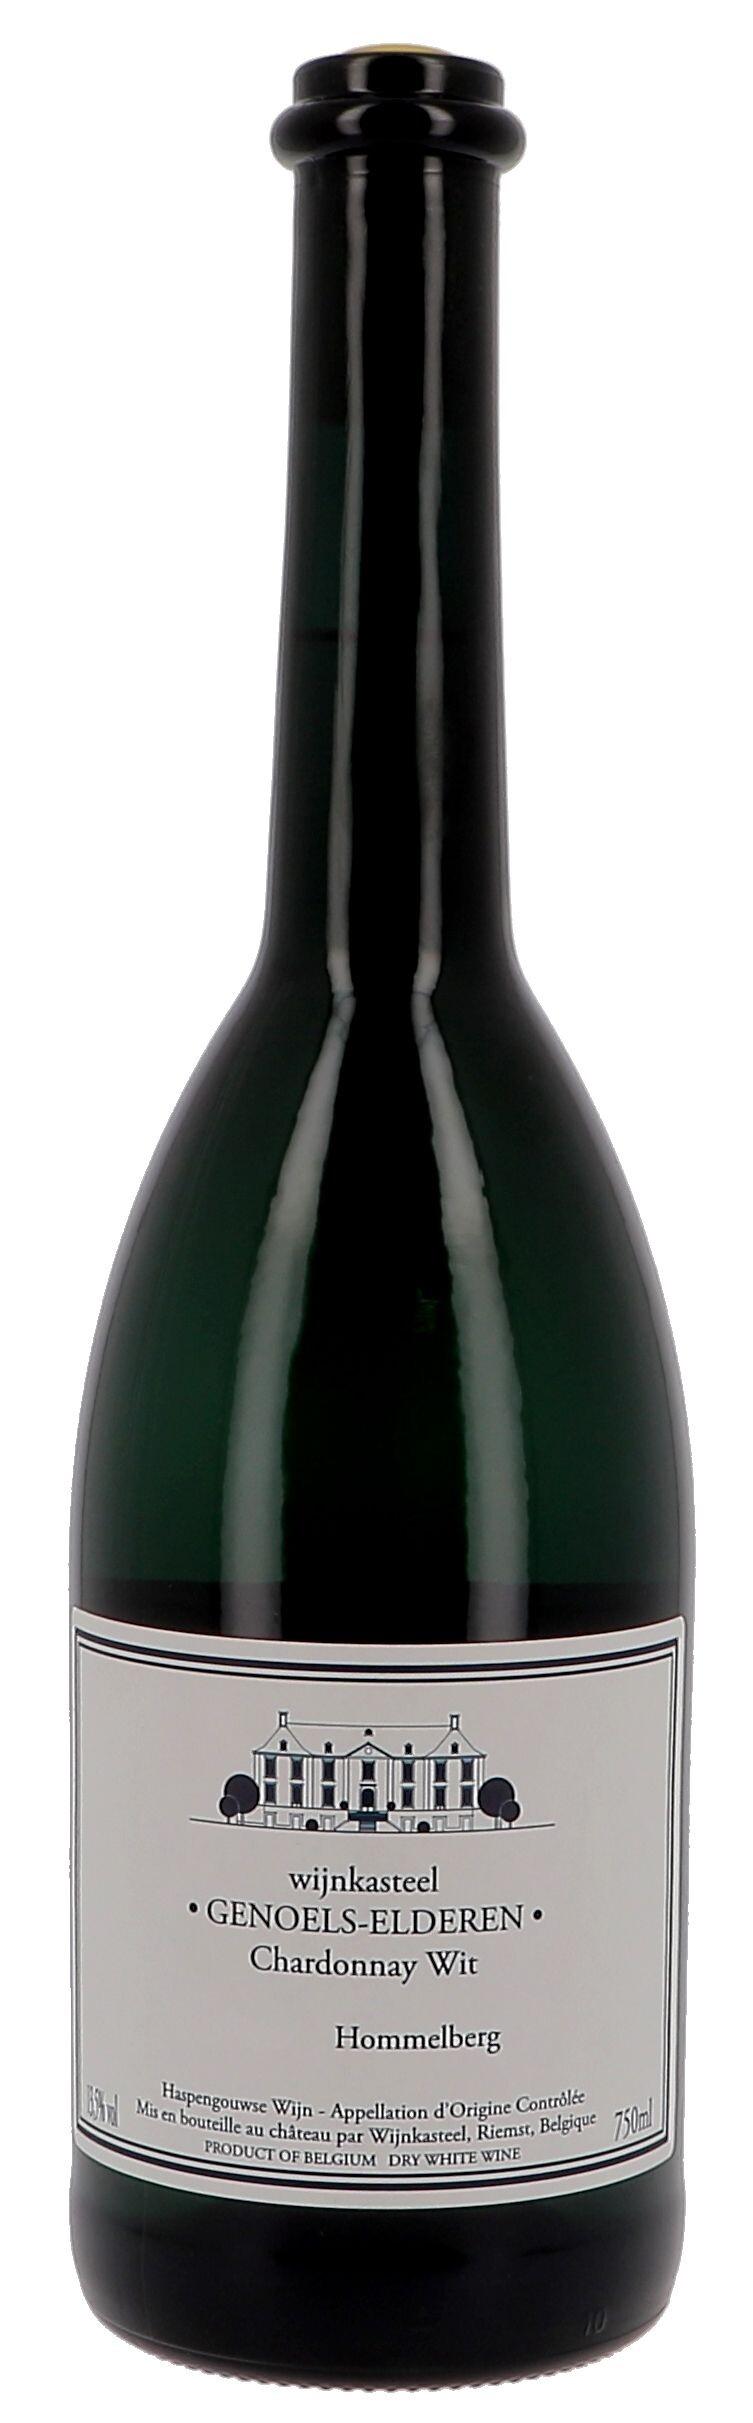 Chardonnay White Label 75cl Winecastle Genoels-Elderen